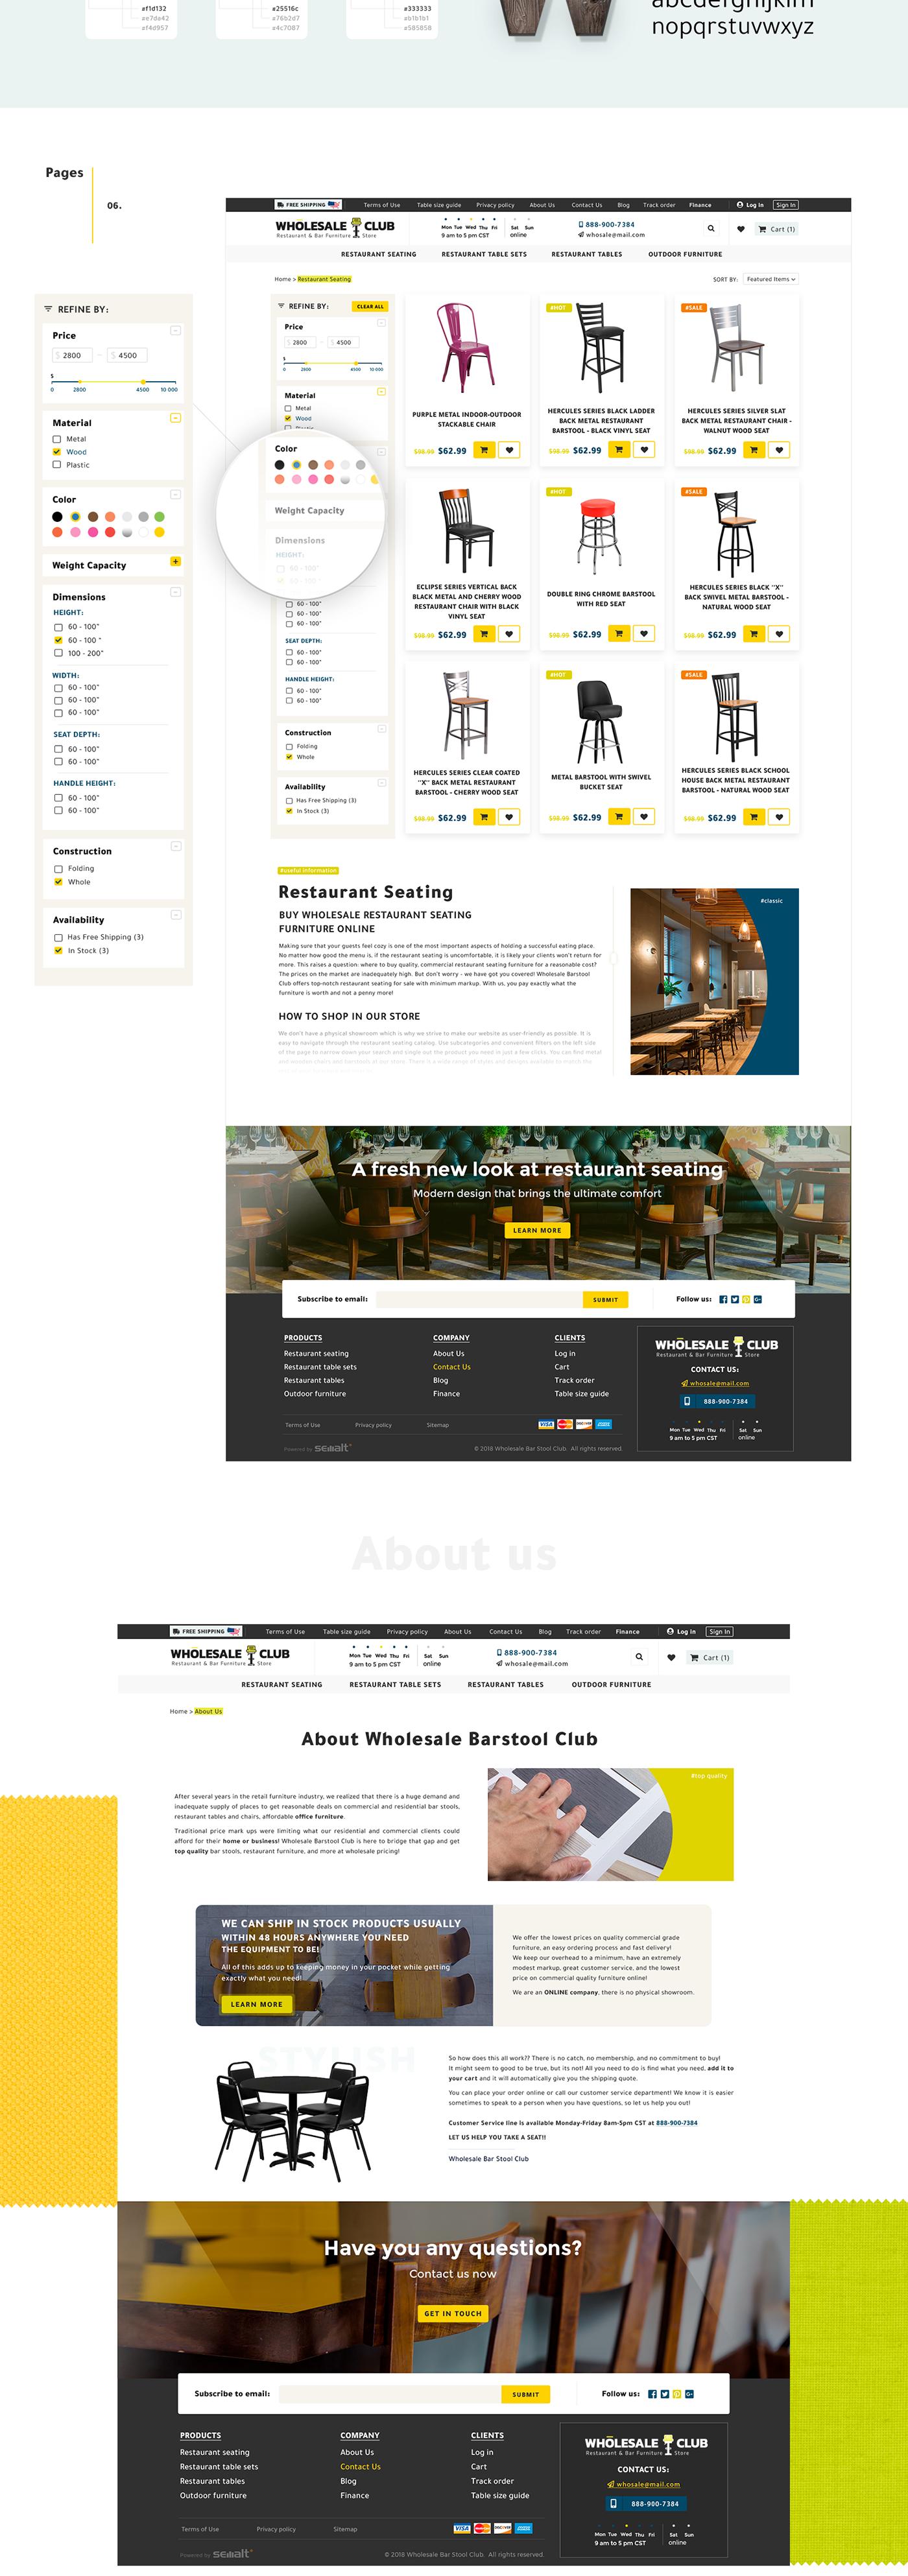 ux xD interaction yellow black e-commerce brand shop Interior Scandinavian